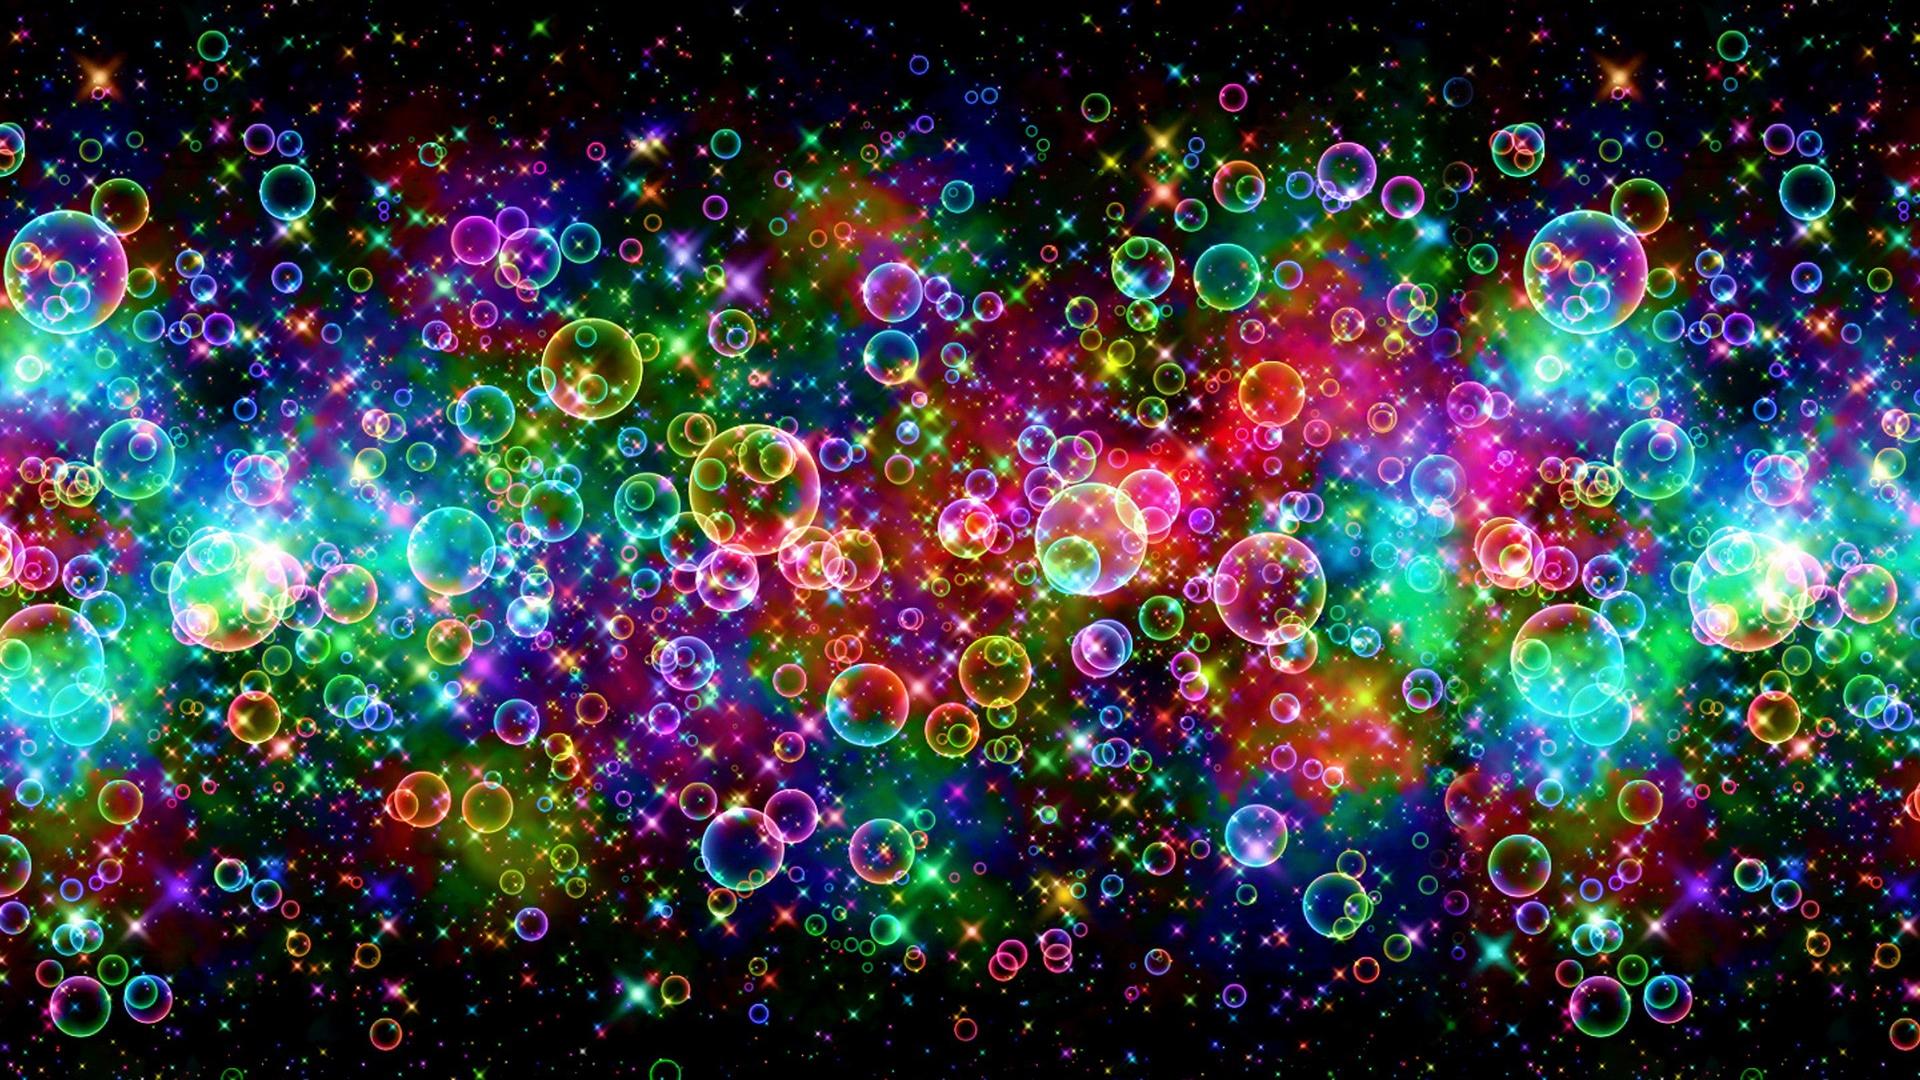 Free Download Rainbow Colour Wallpaper Colors Wallpaper 34511203 1920x1080 For Your Desktop Mobile Tablet Explore 75 Cool Rainbow Wallpaper Rainbow Color Wallpaper Rainbow Wallpaper Backgrounds Rainbow Sunshine Wallpapers